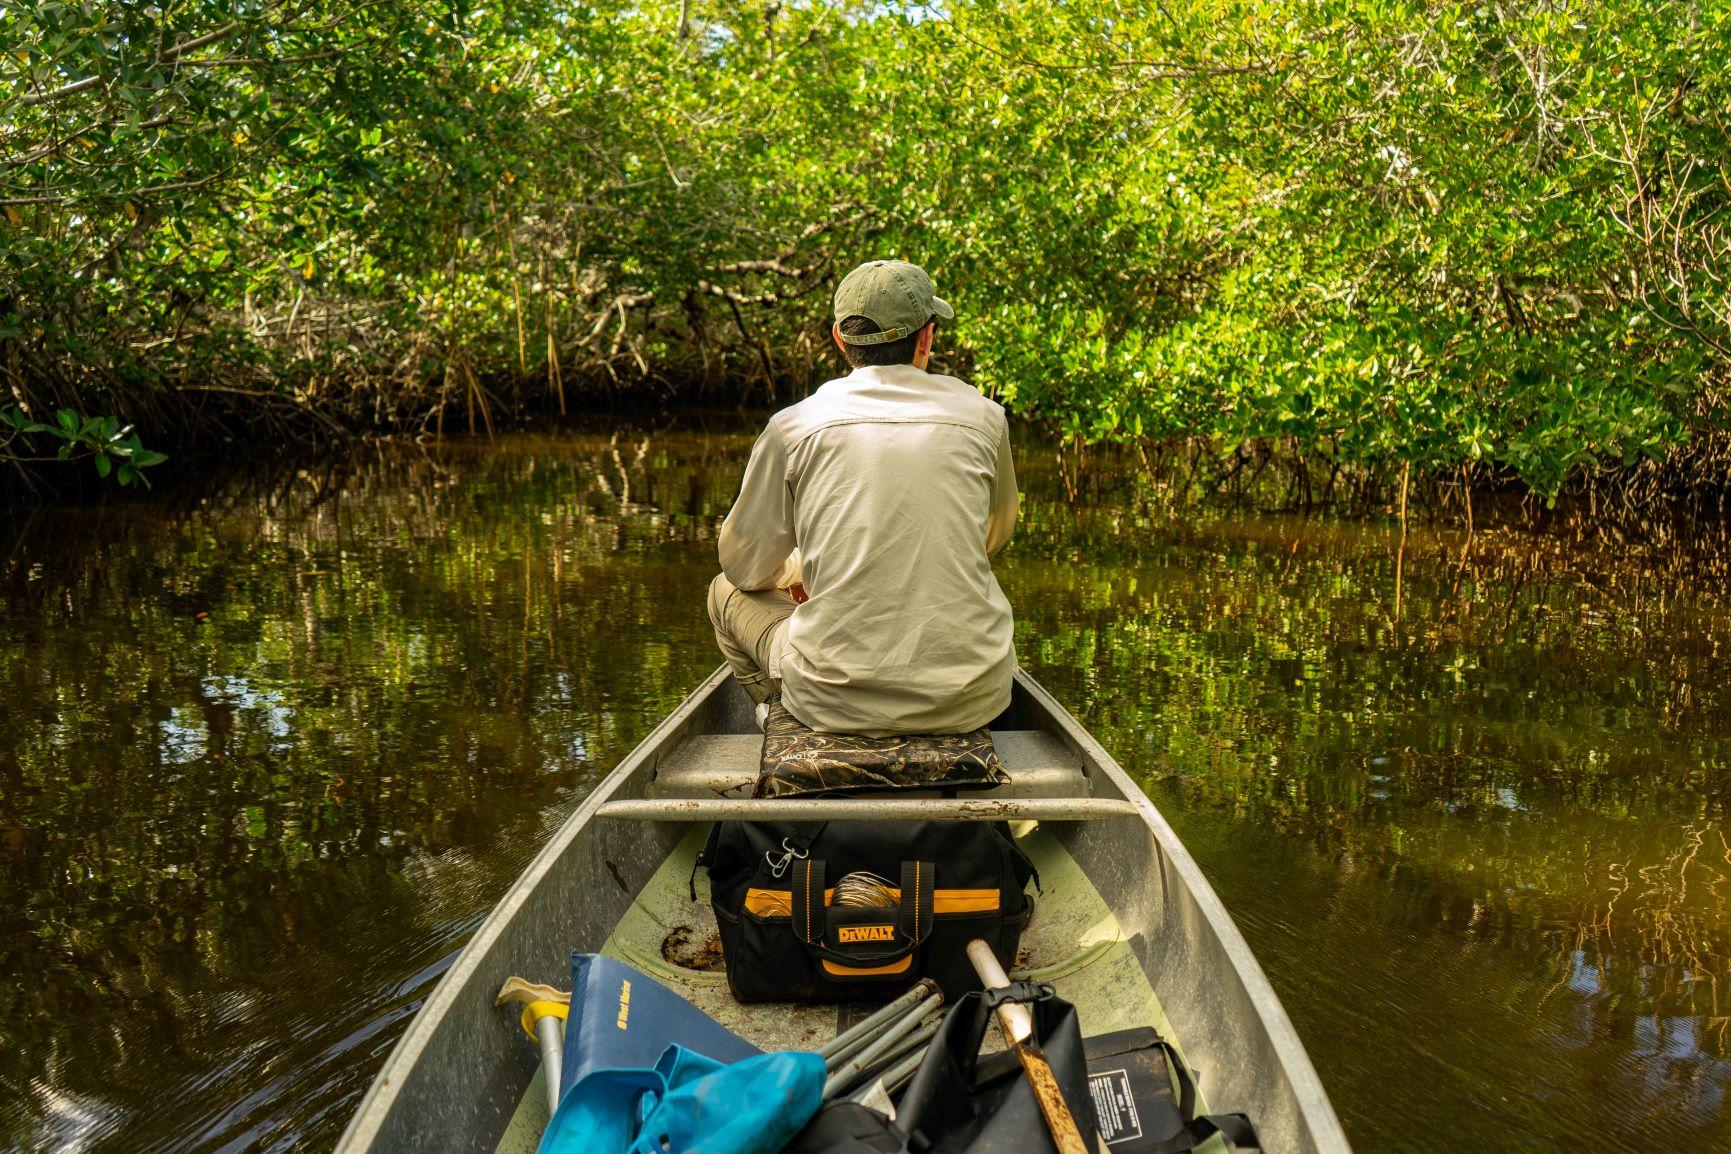 Mangrove Work - Our Work